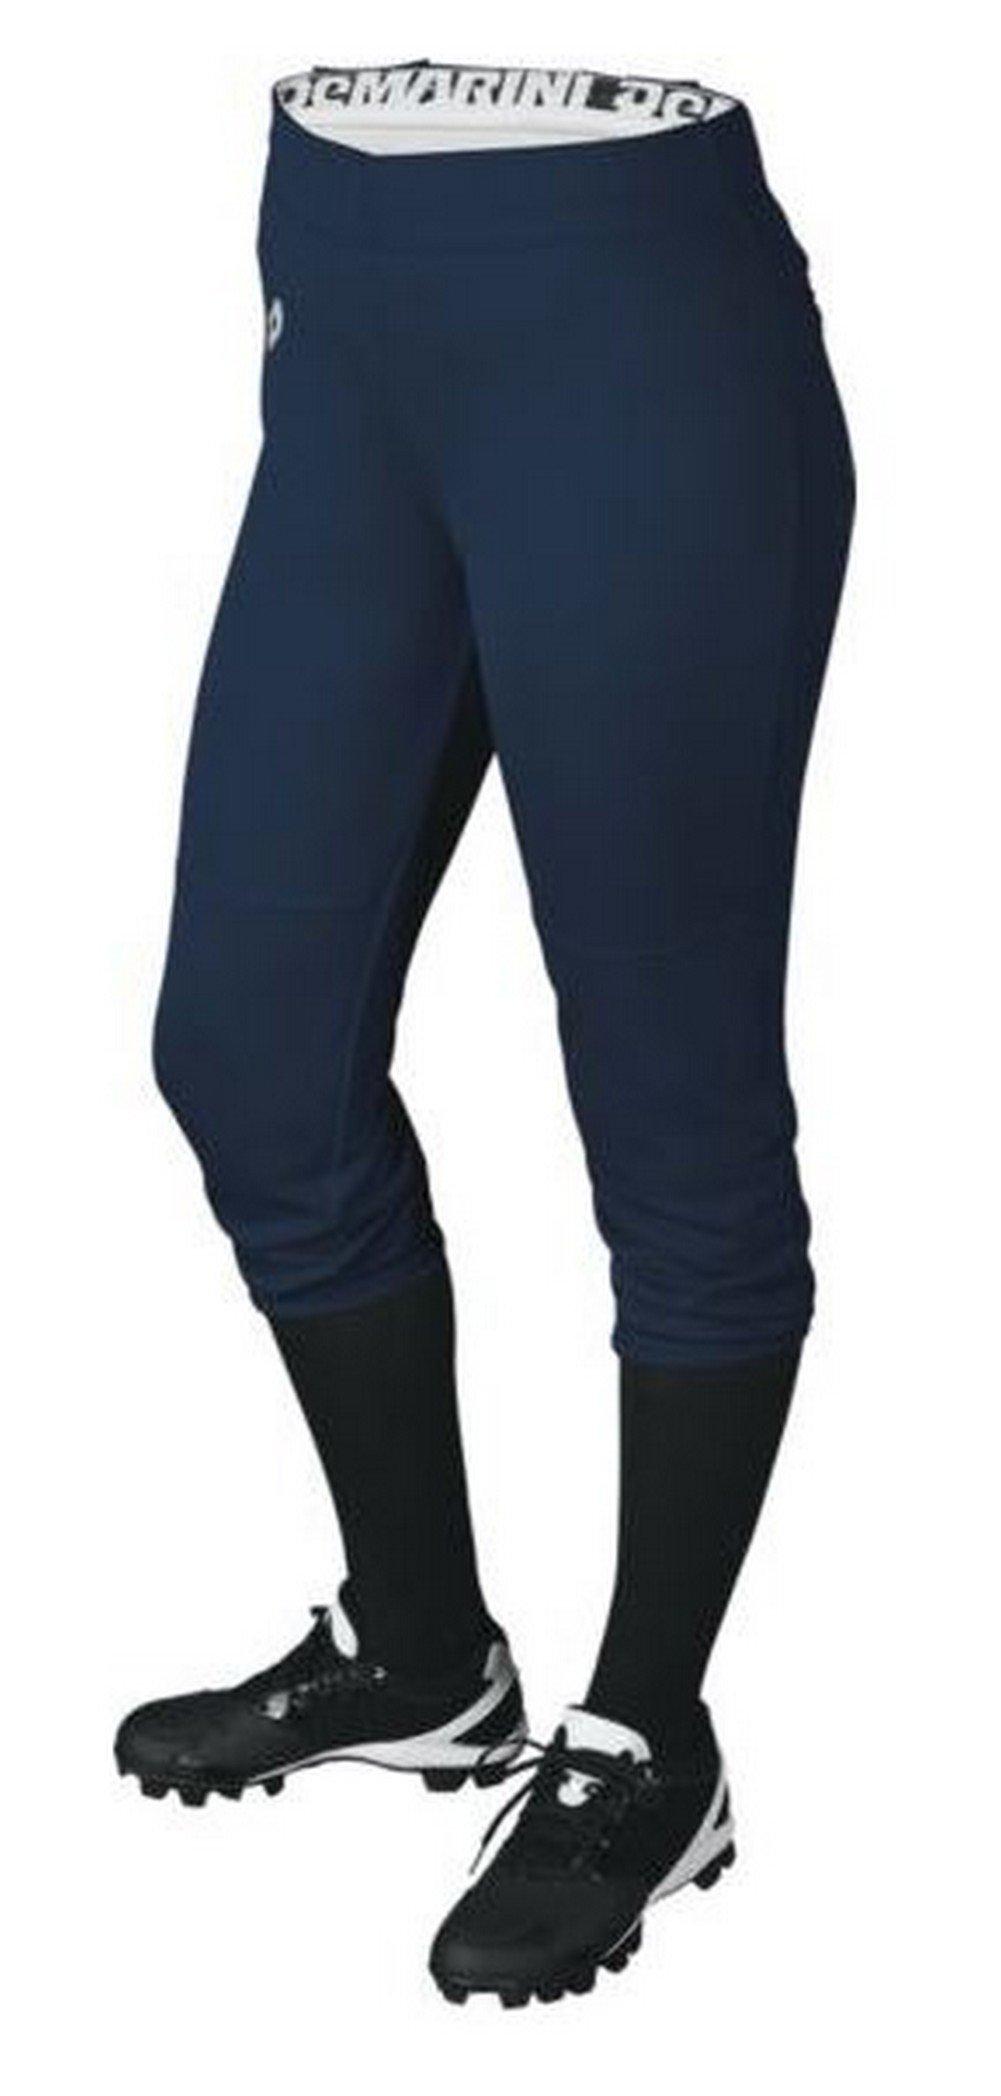 DeMarini Womens Sleek Pull Up Pant, Navy, Medium by DeMarini (Image #1)